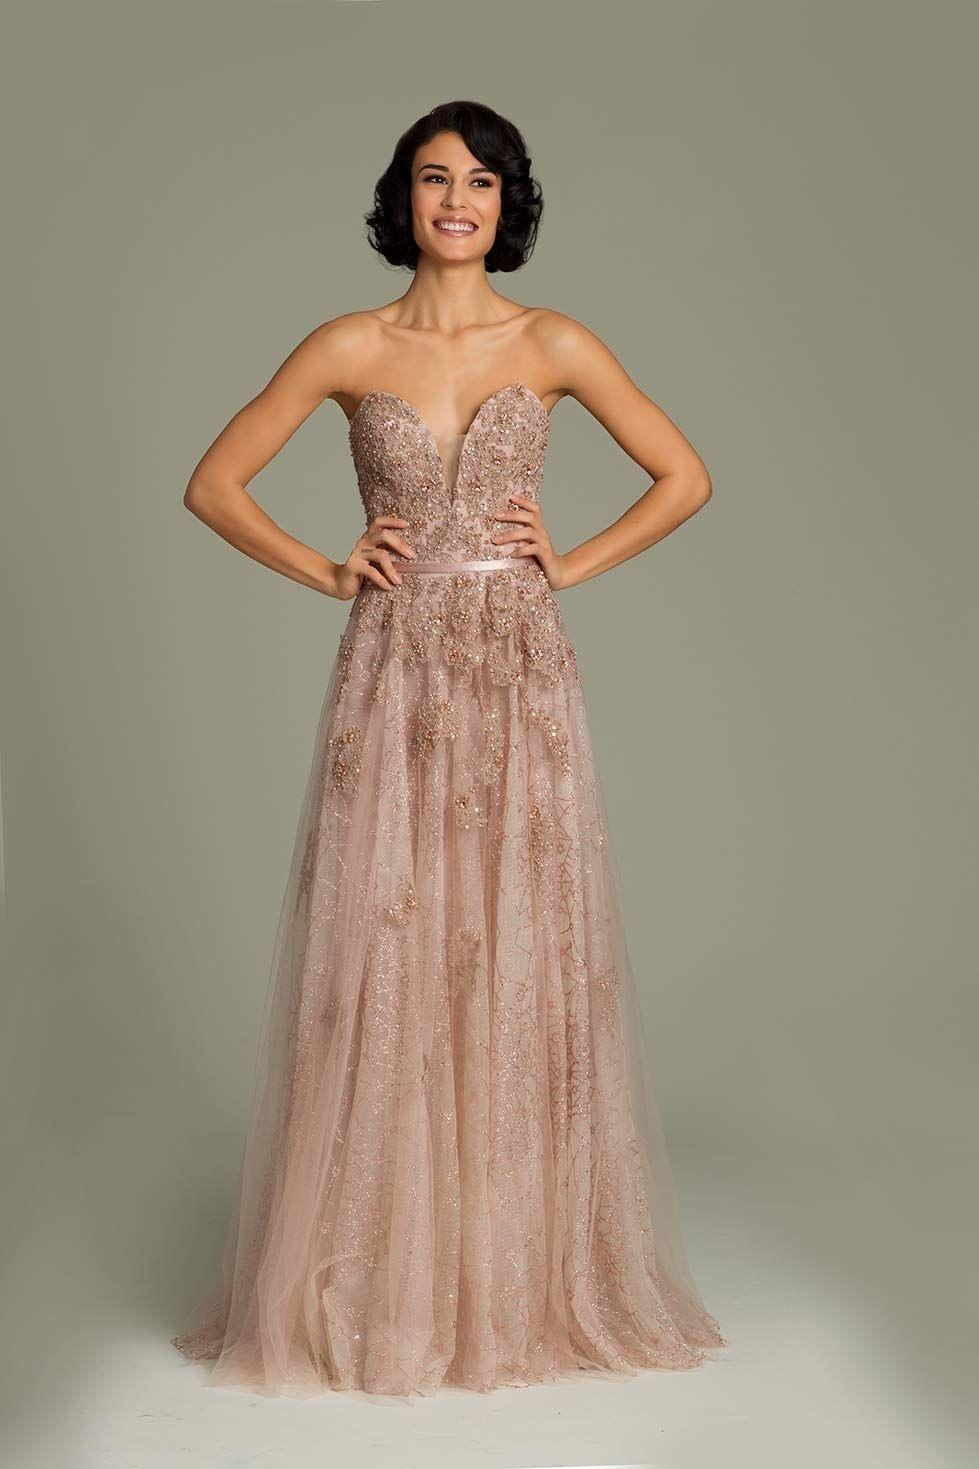 17 Luxurius Abschlusskleider Lang Rosa Bester PreisFormal Wunderbar Abschlusskleider Lang Rosa Vertrieb